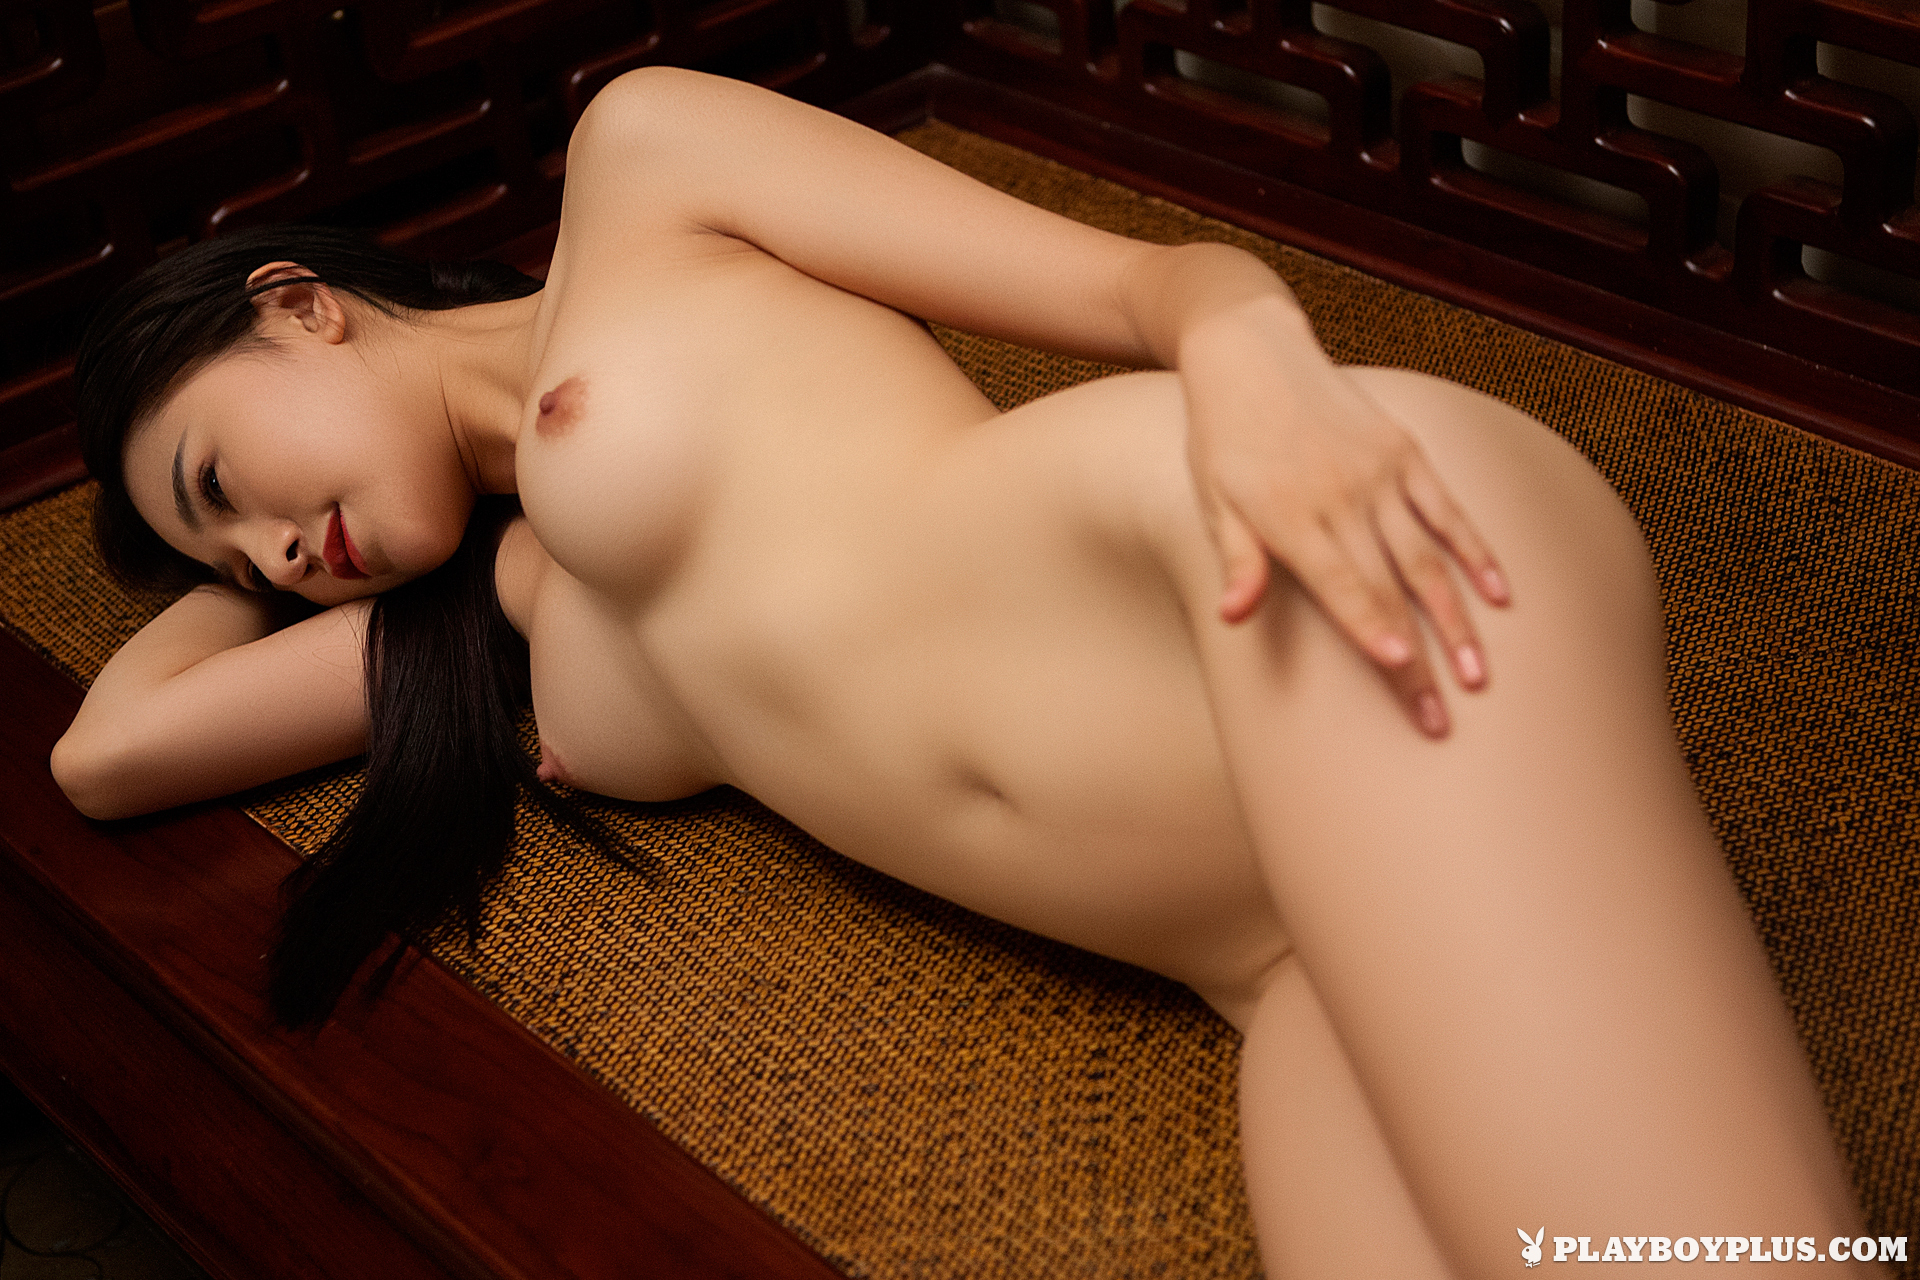 wu-muxi-nude-chinese-girl-short-dress-playboy-22